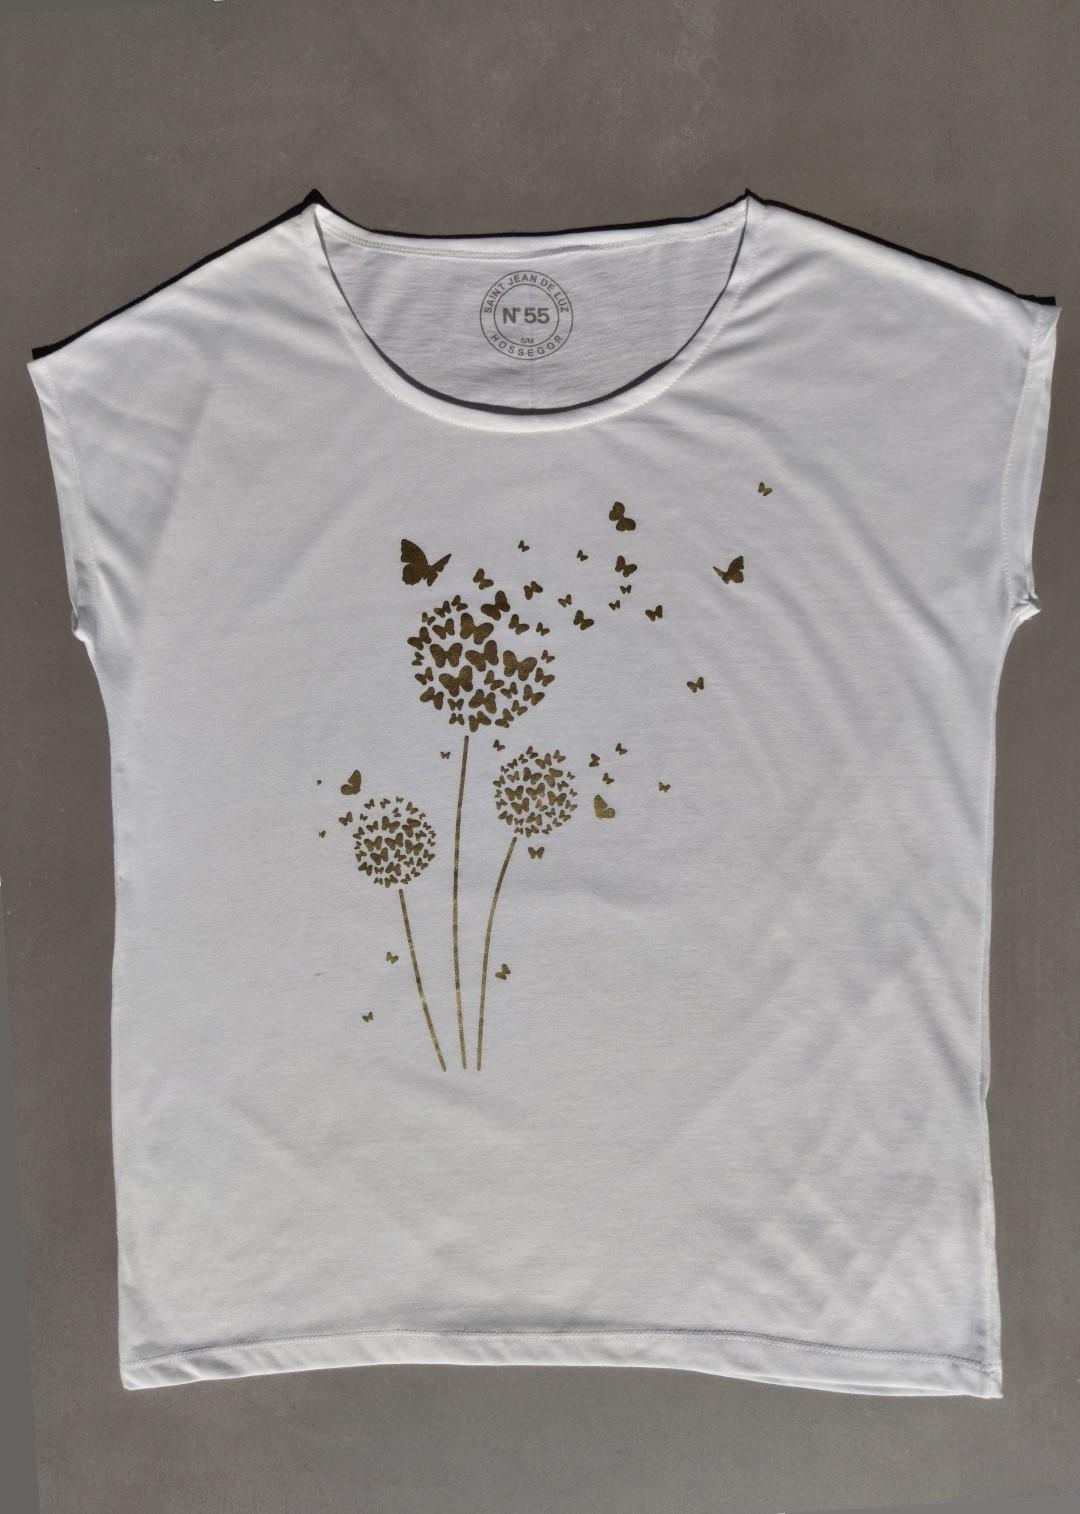 Tee shirt blanc N°55 fleurs et papillons or.